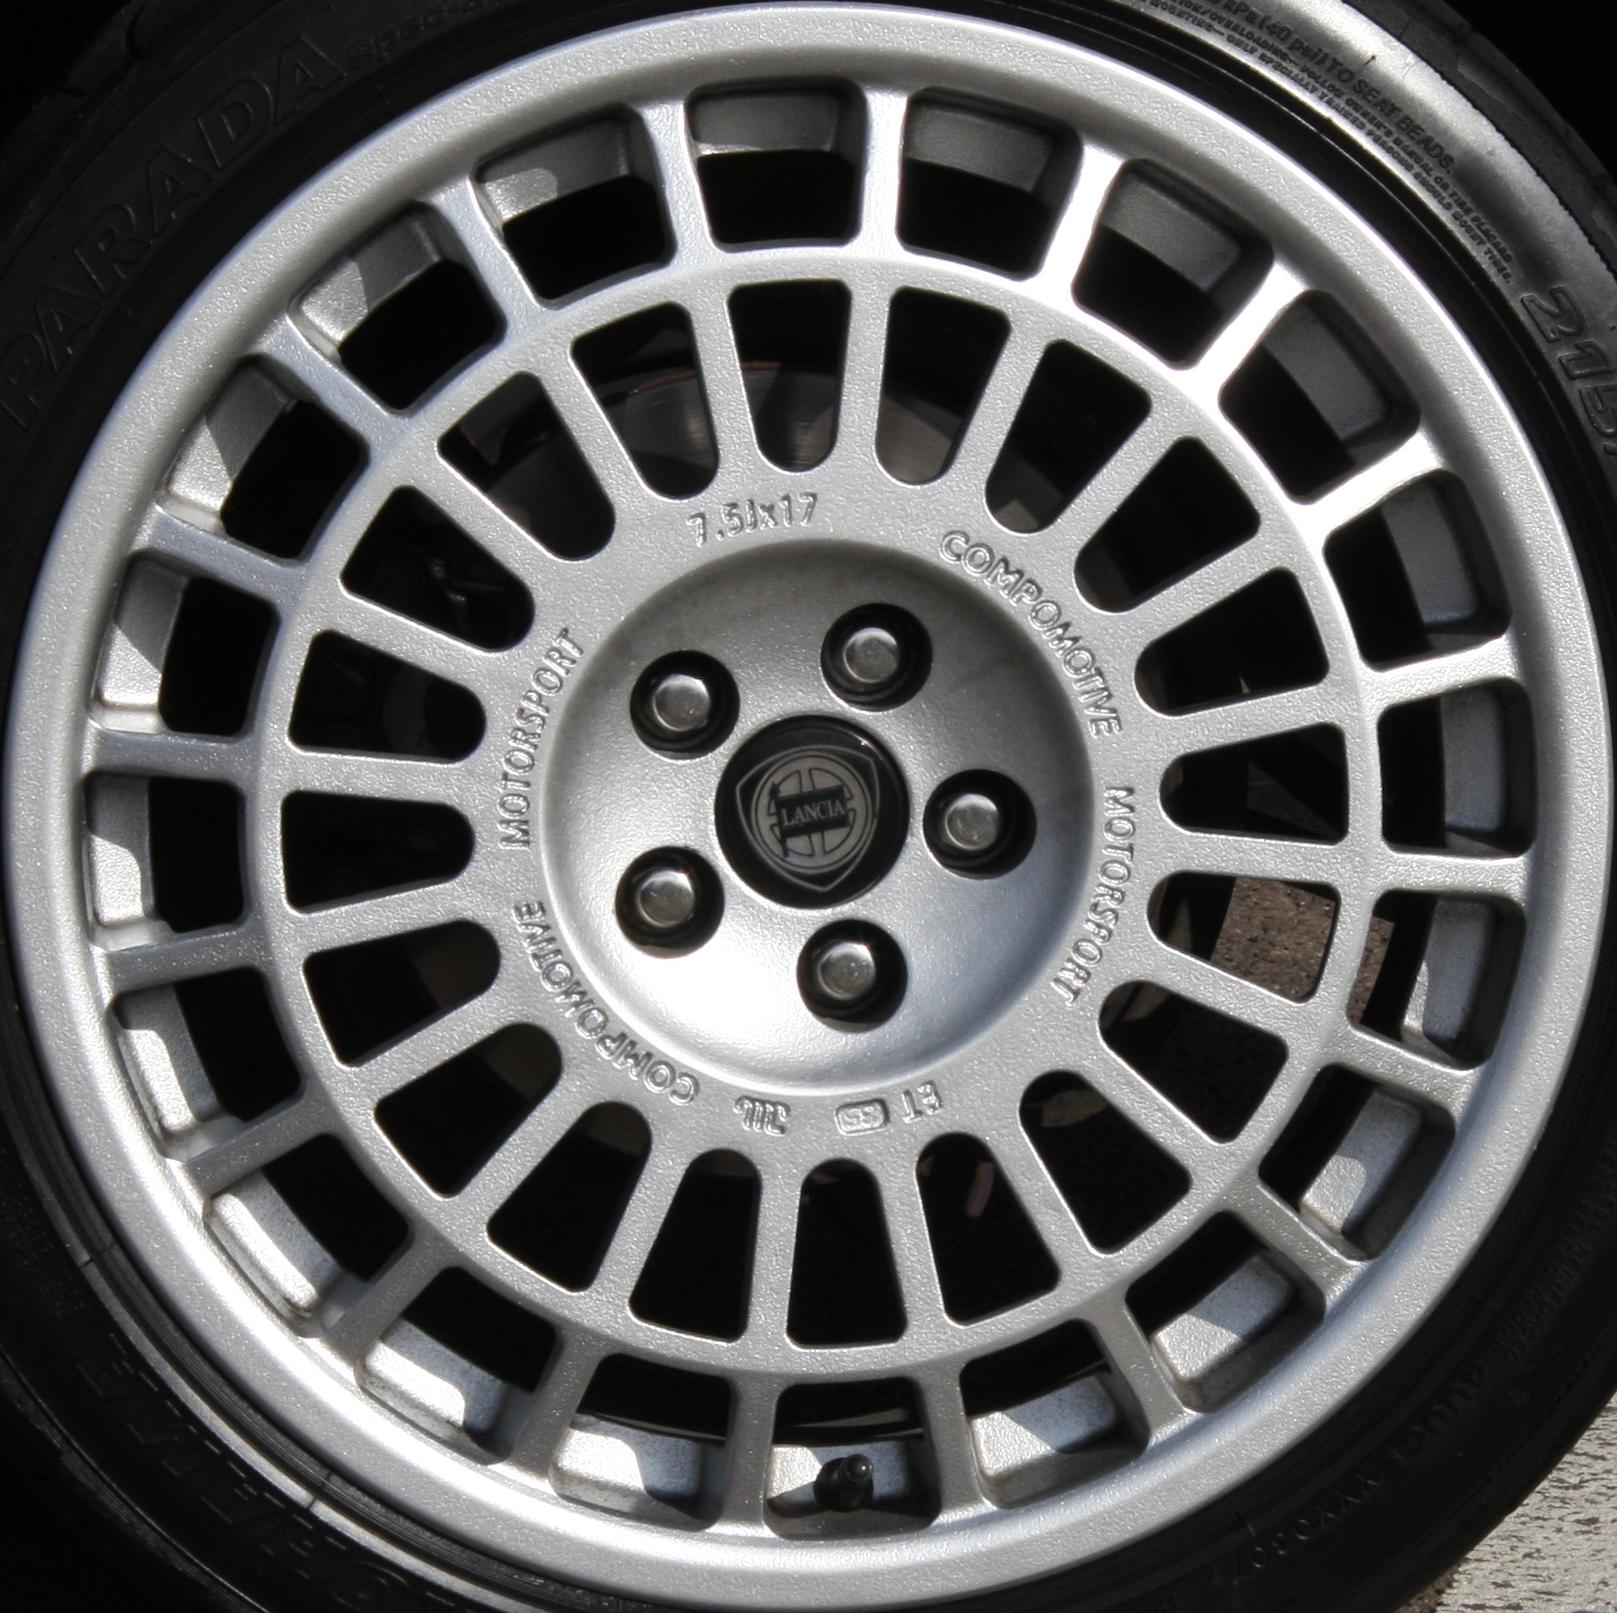 The 10 Most Iconic Wheels In Automotive History Alfa Romeo Magnesium Http Uploadwikimediaorg Wikipedia Commons 0 07 Lancia Integrale Wheel Flickr Exfordy